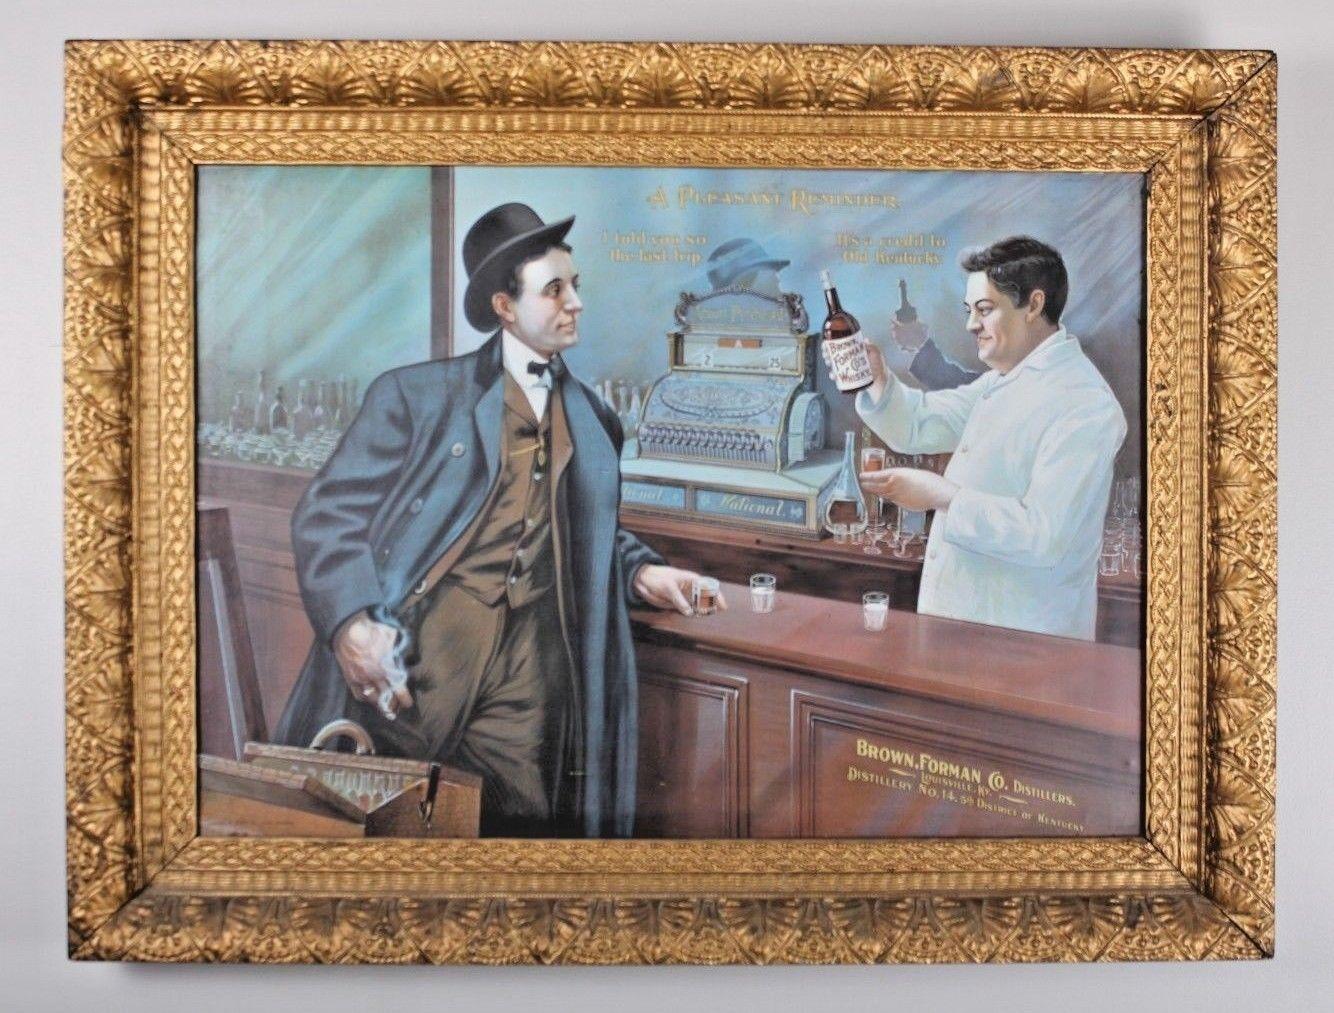 Brown-Forman Co., Distillers, Louisville, KY Sign, Pre-Pre ca. 1900